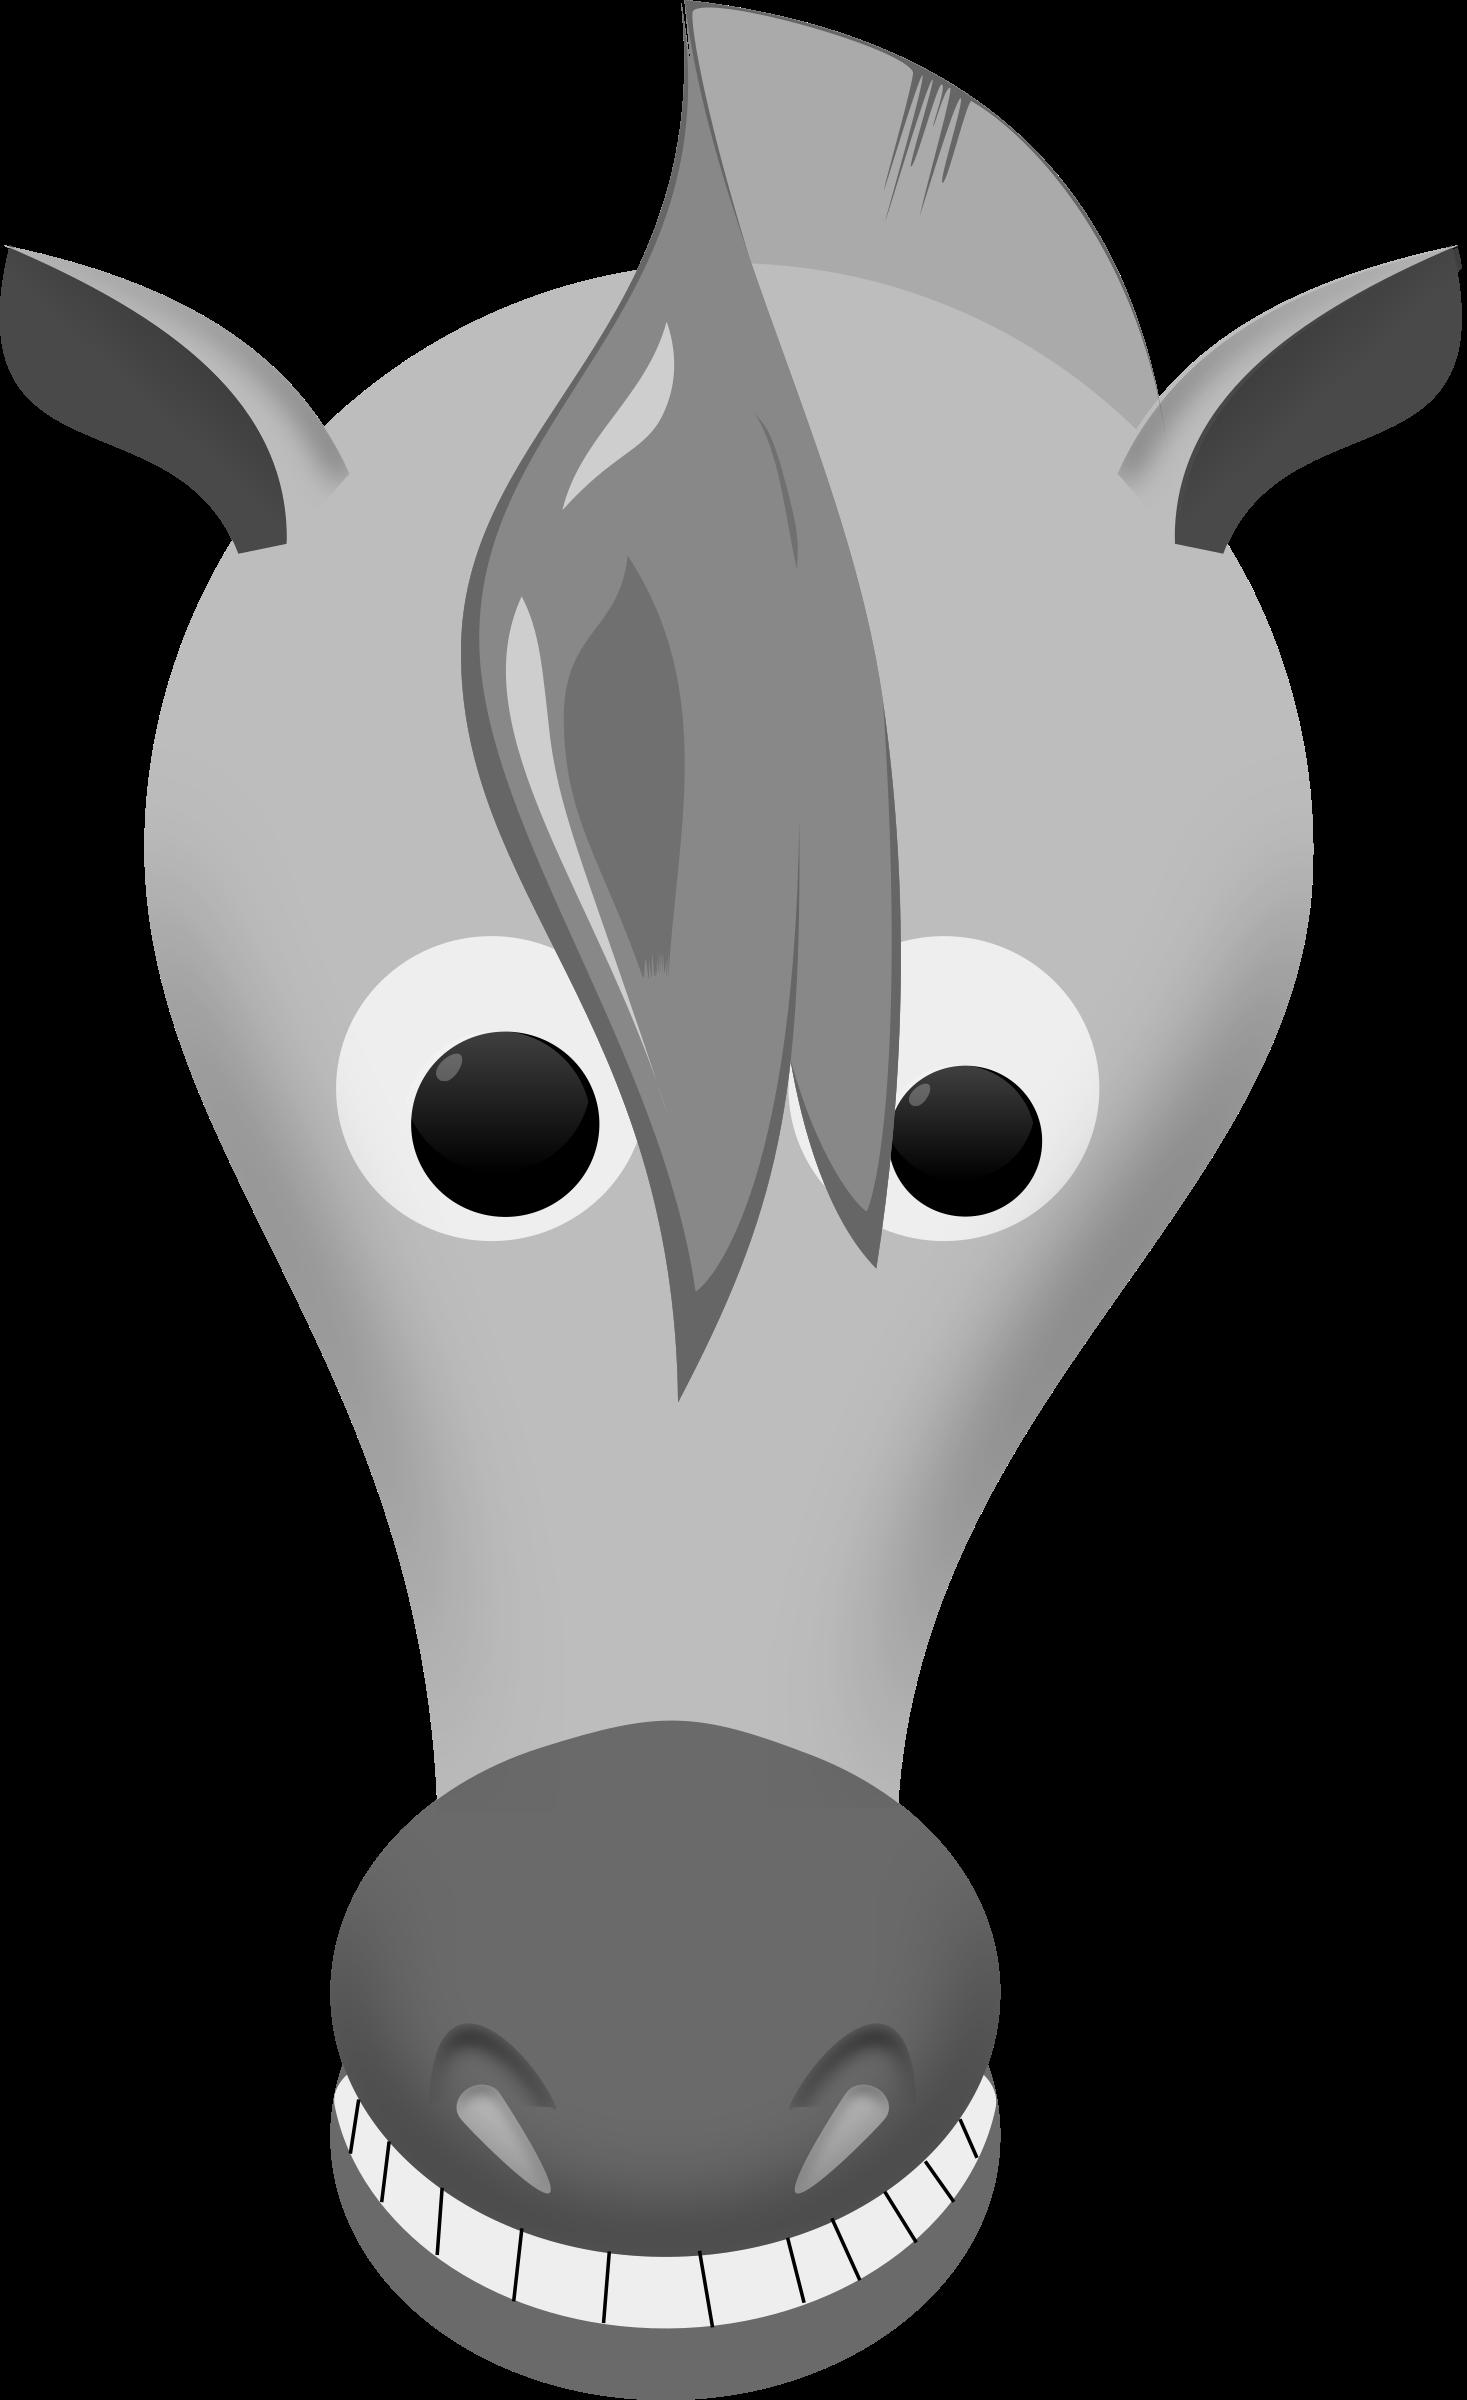 Face clipart black and white. Horse clipartblack com animal